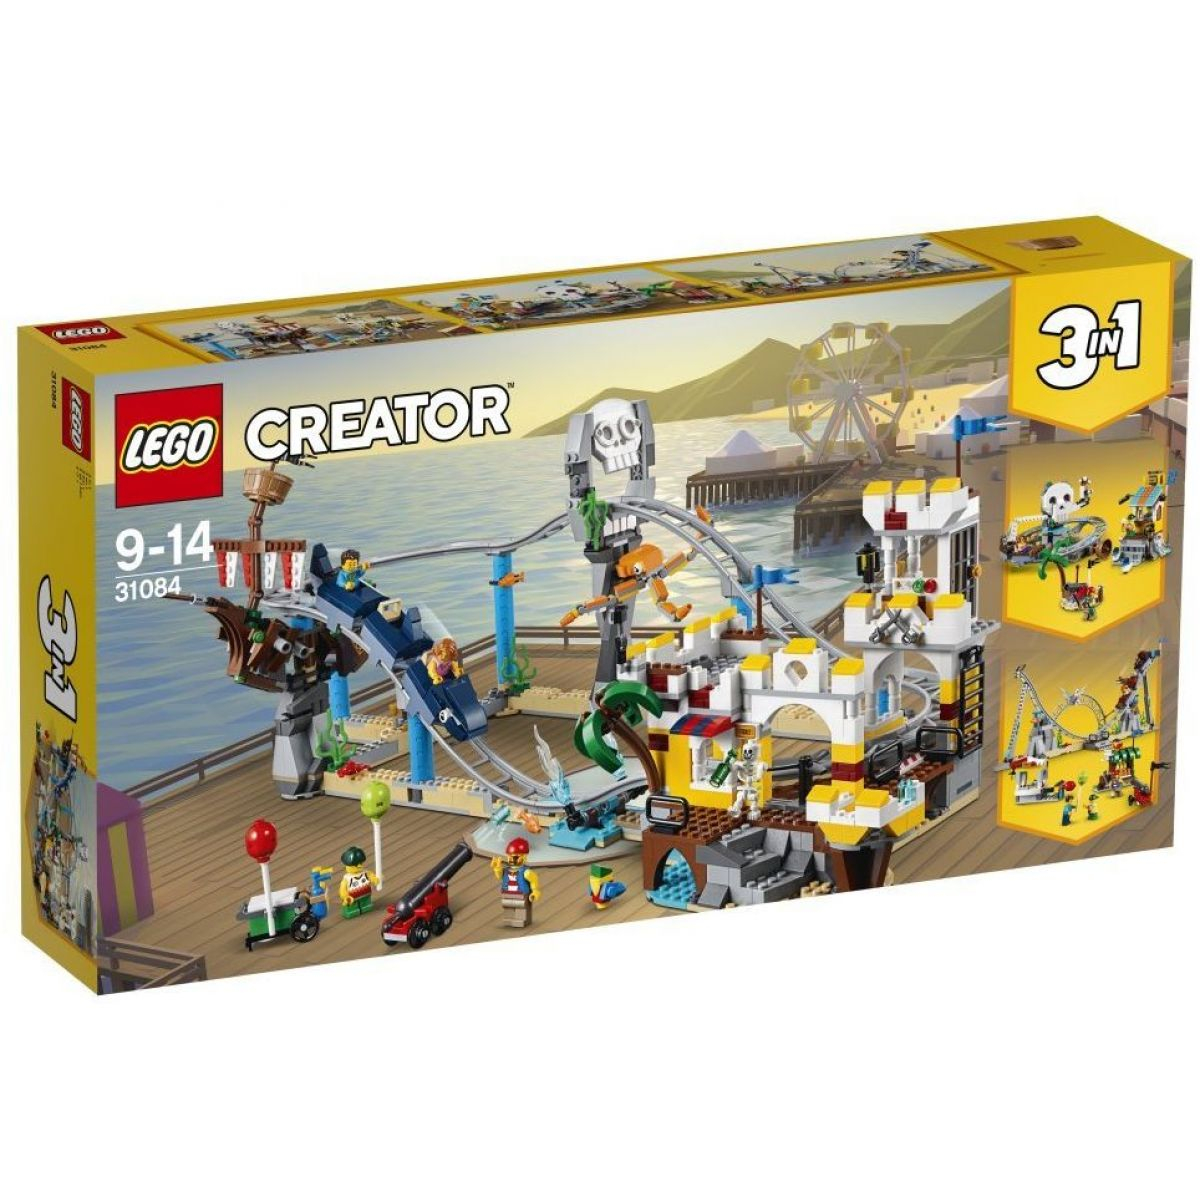 LEGO Creator 31084 Pirátská horská dráha - Poškozený obal